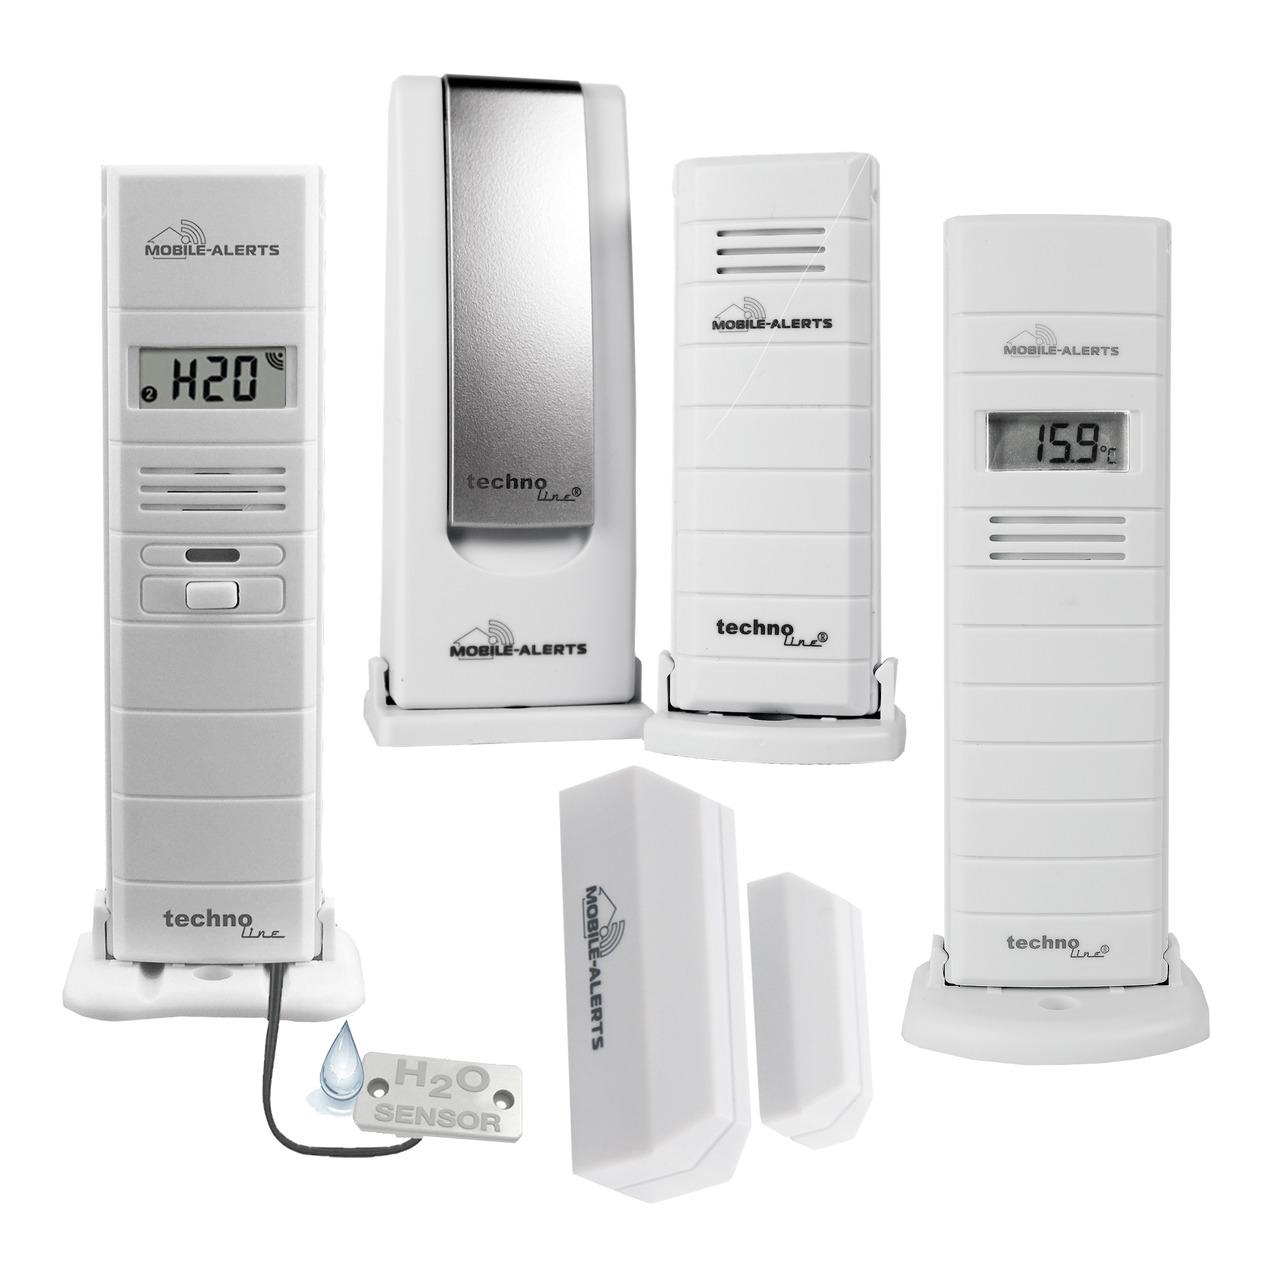 ELV Mobile Alerts Wetterset (Gateway- Temperatursensor- 2x Thermo-/Hygrosensor- Fensterkontakt)